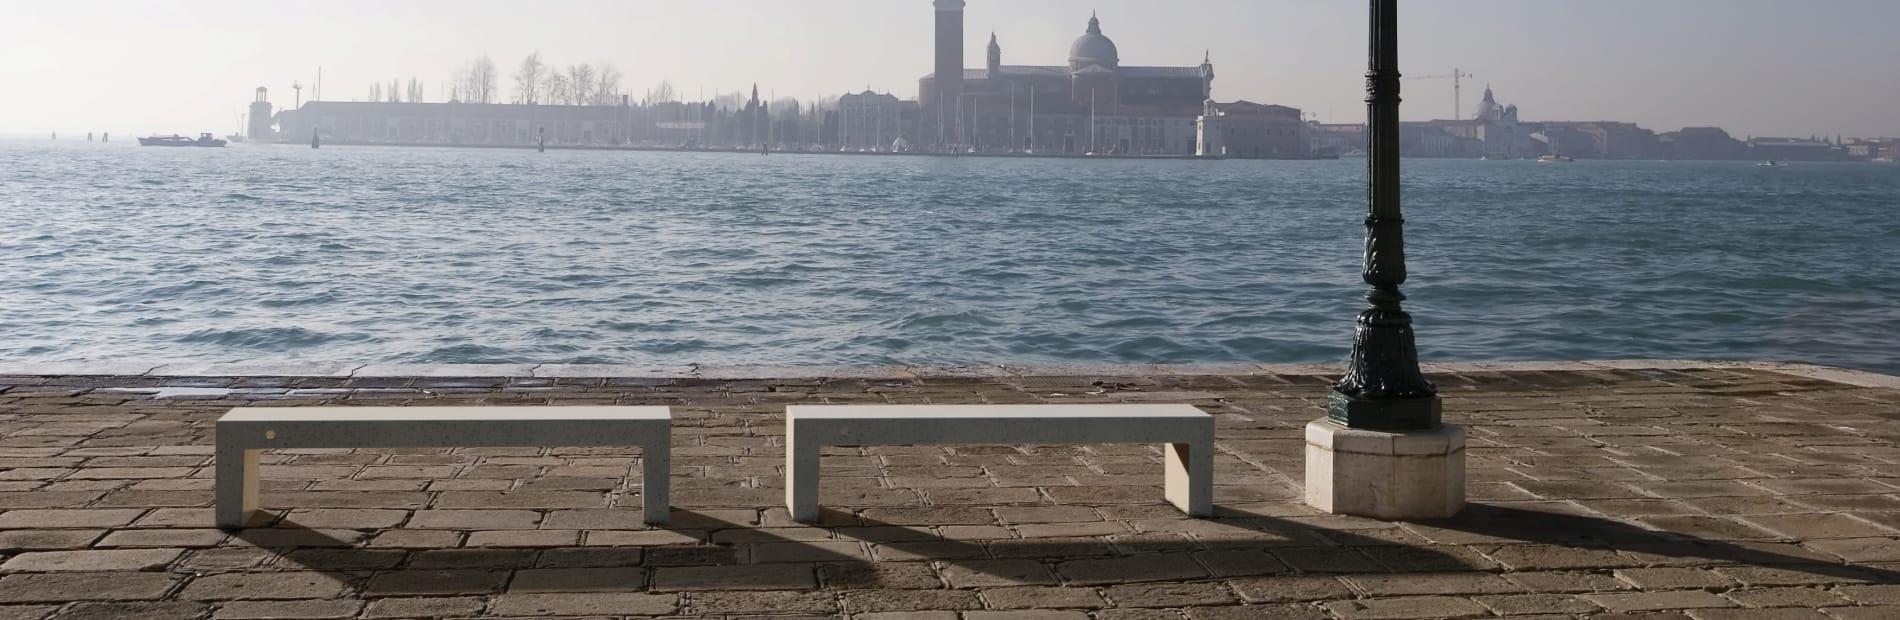 venezia precious stone bench